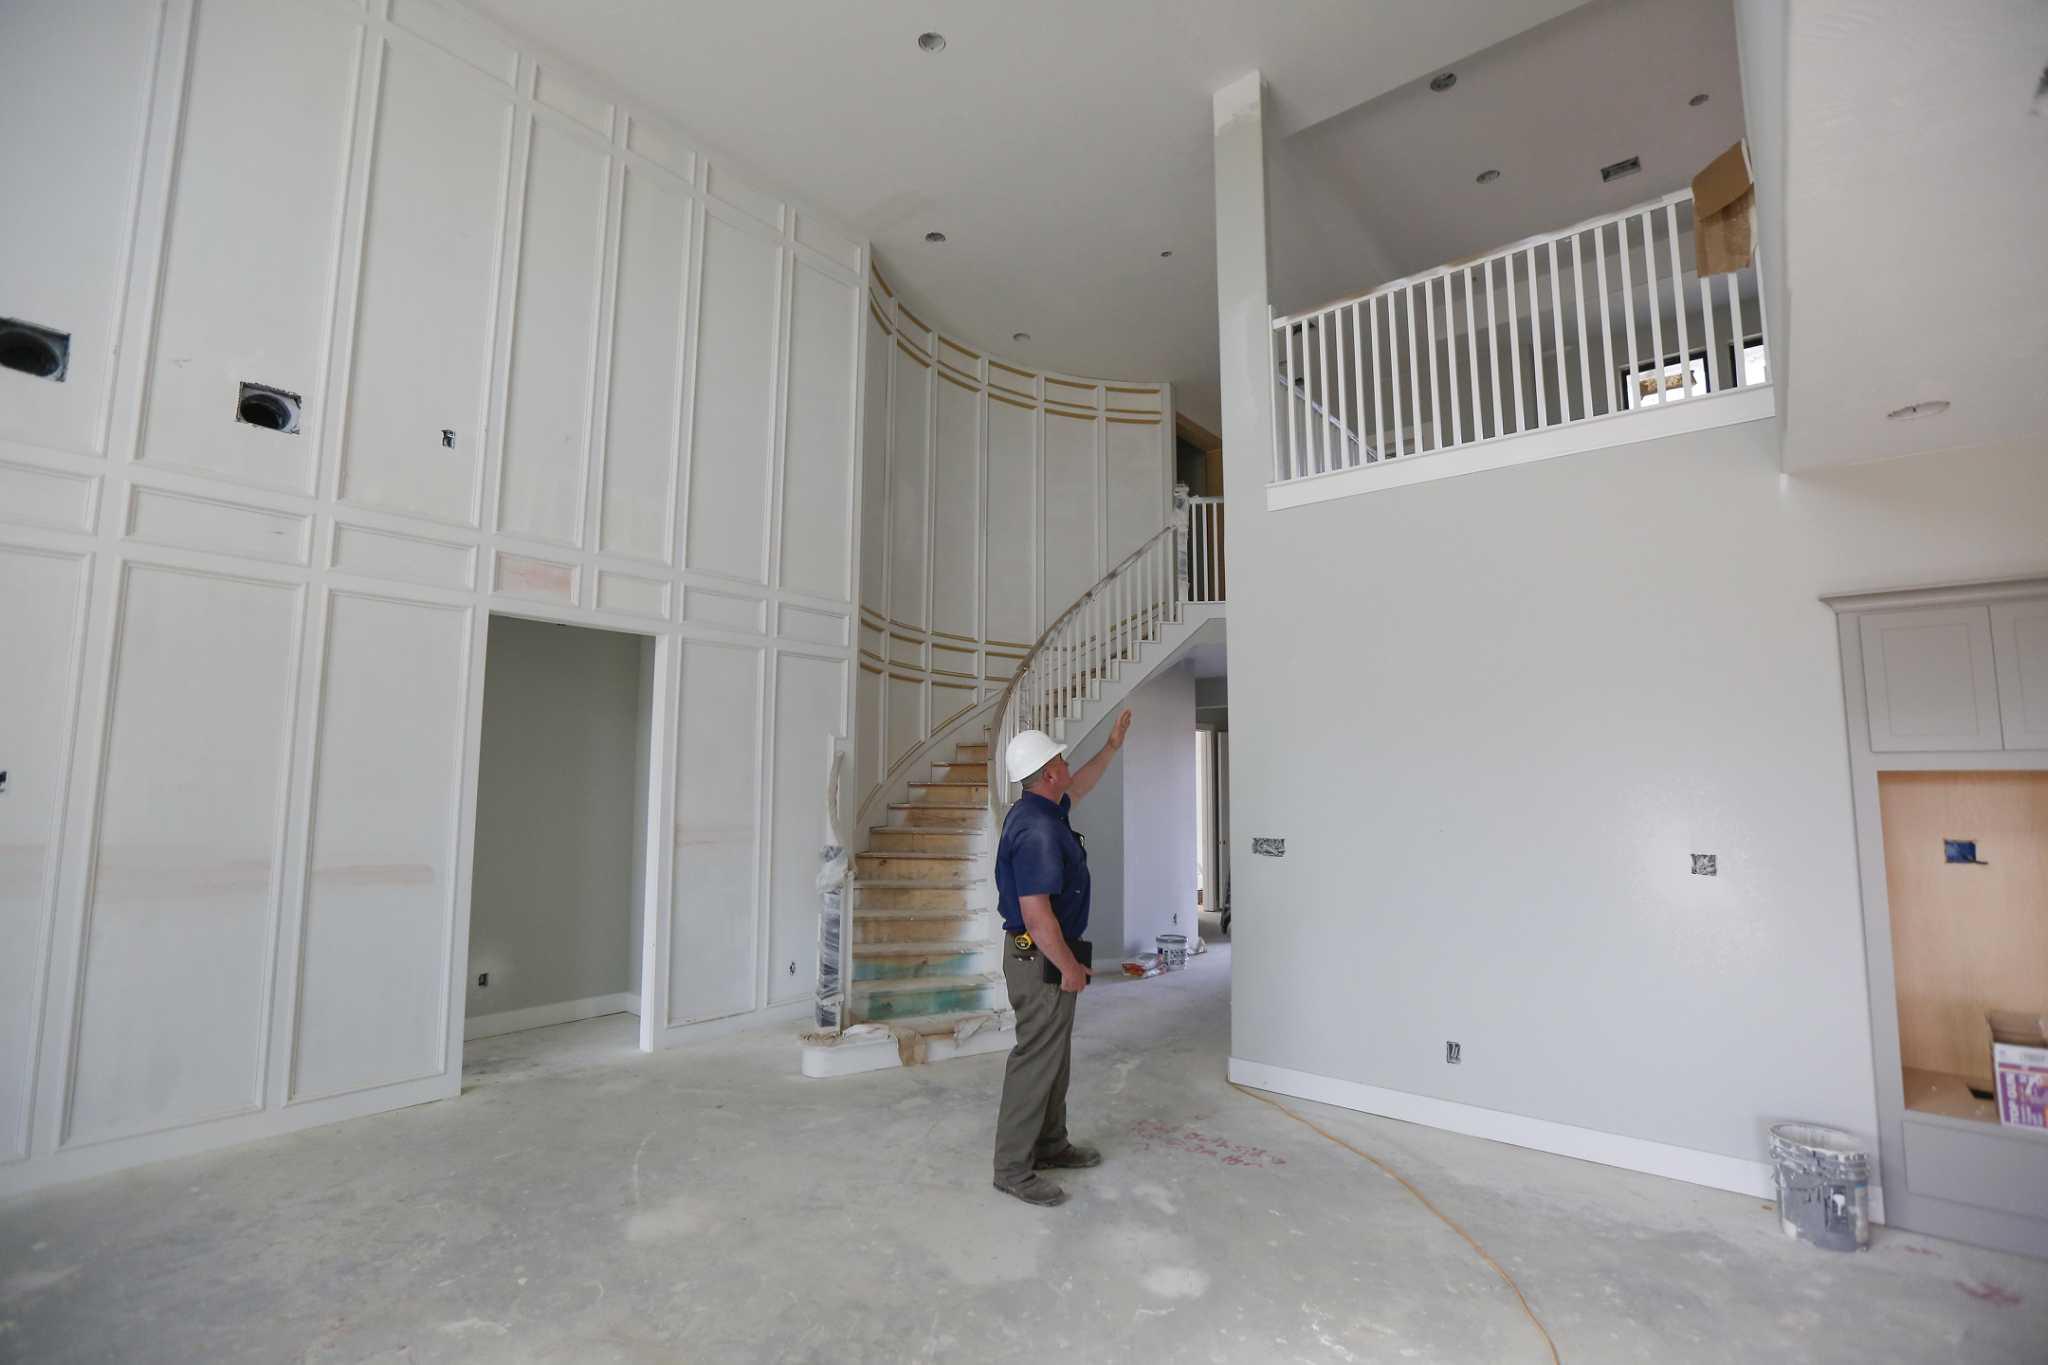 Homebuilders adjust to rising costs, shrinking margins